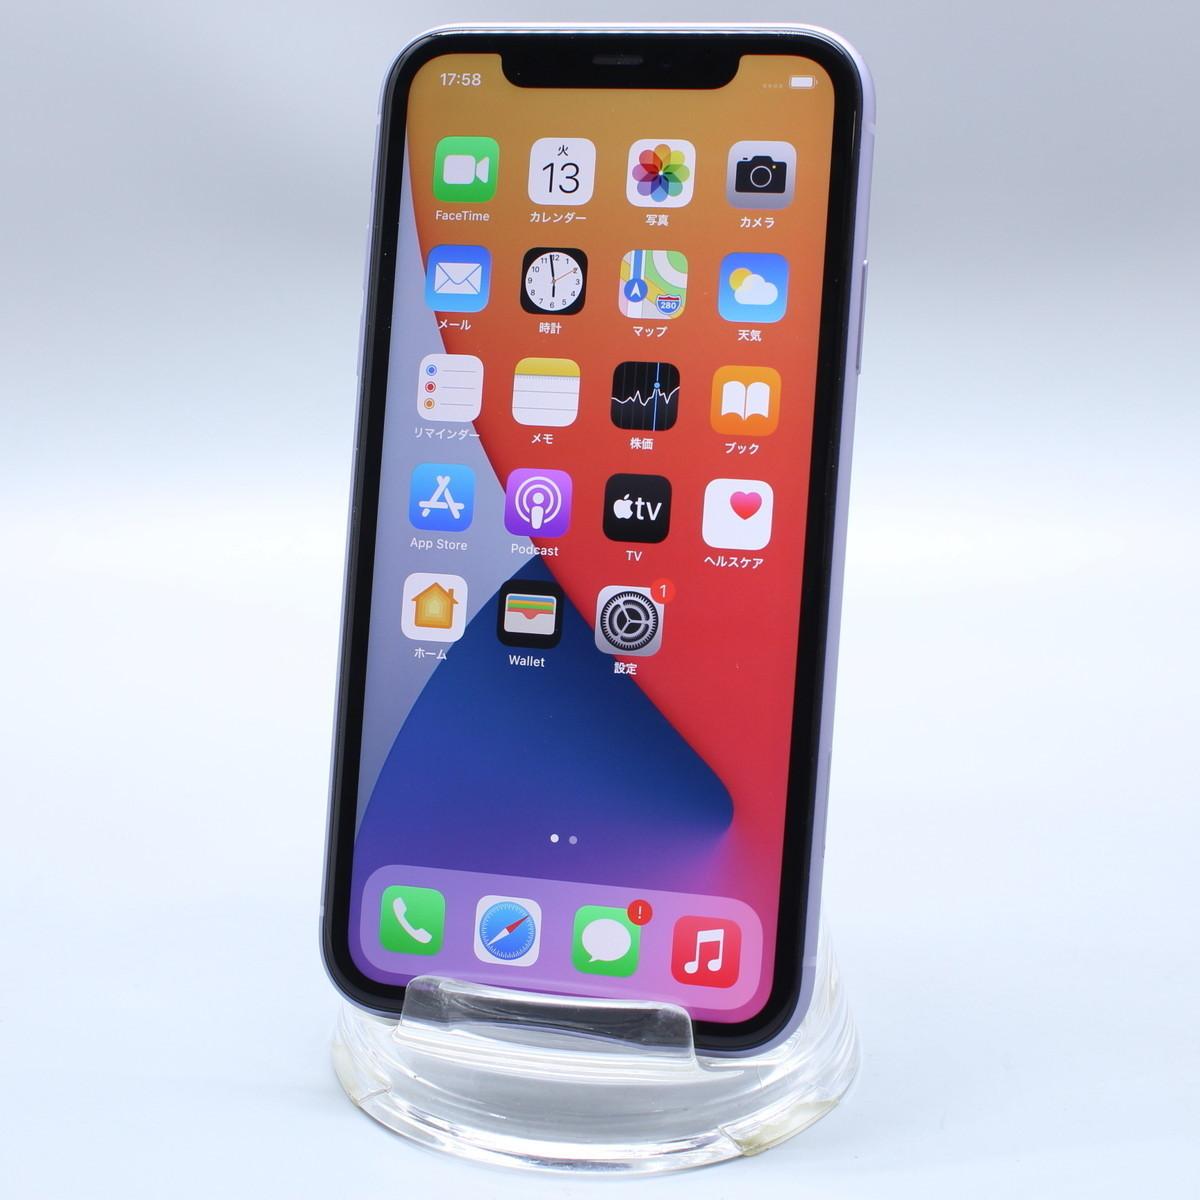 Apple iPhone11 64GB パープル A2221 MWLX2J/A バッテリ99%■SIMフリー(SIMロック解除済)★Joshin2426【送料無料・1円】